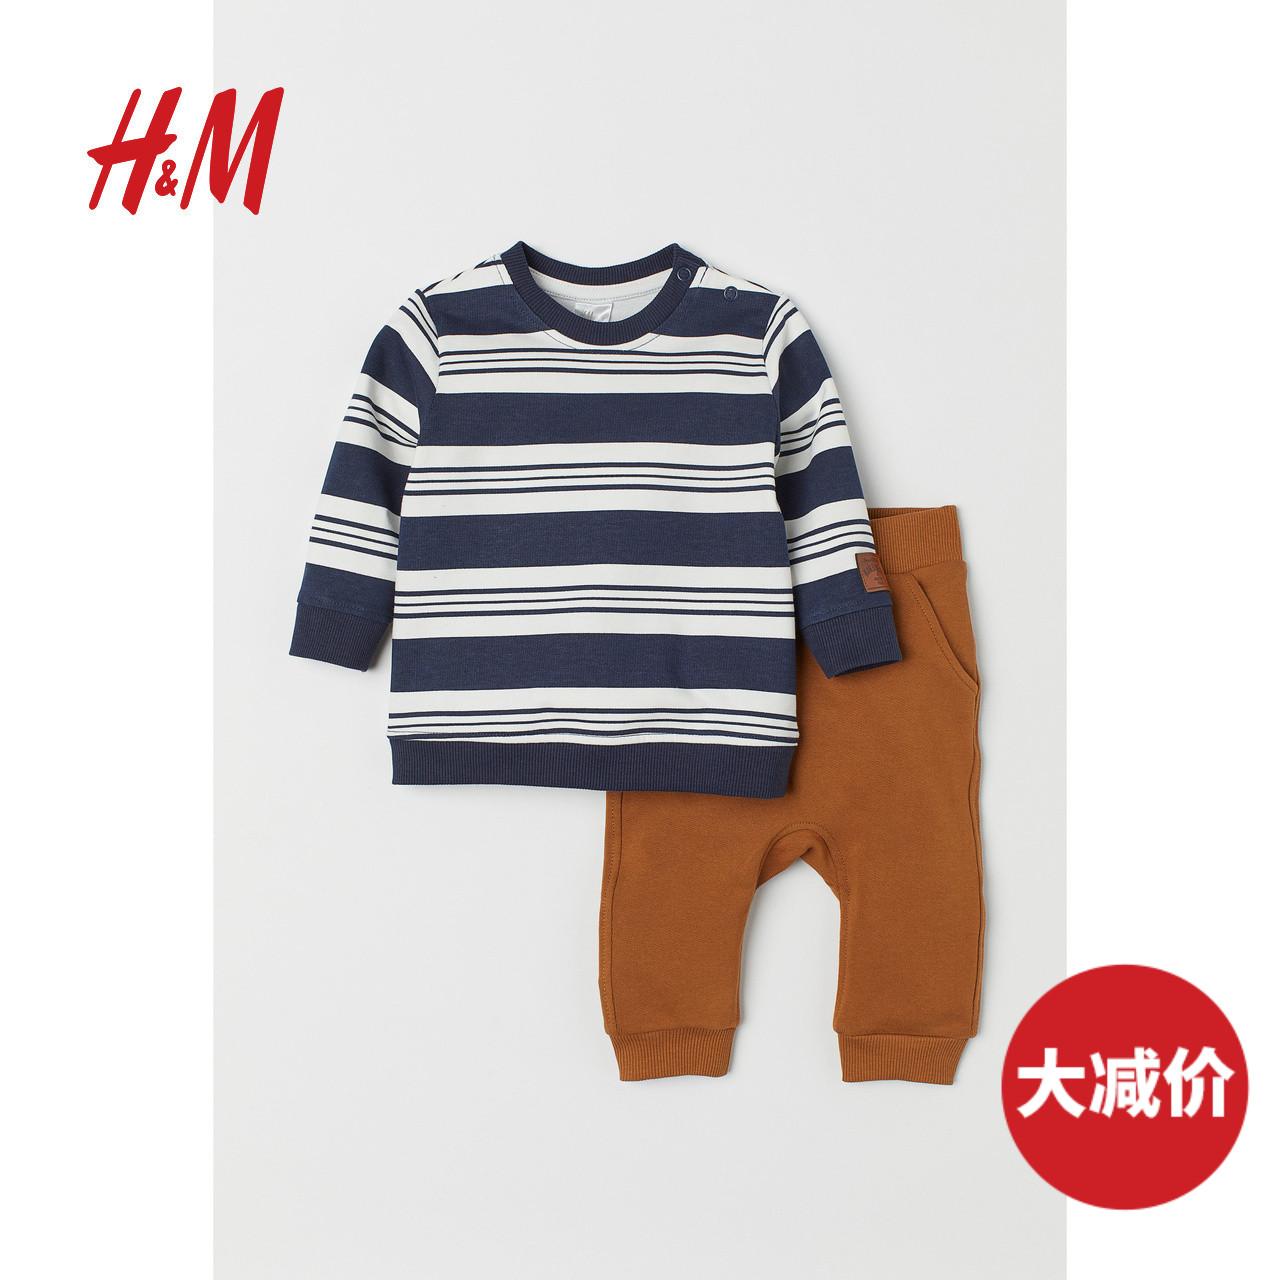 H&M童装男婴幼童套装 2019年春秋新款卫衣和慢跑裤HM0698394